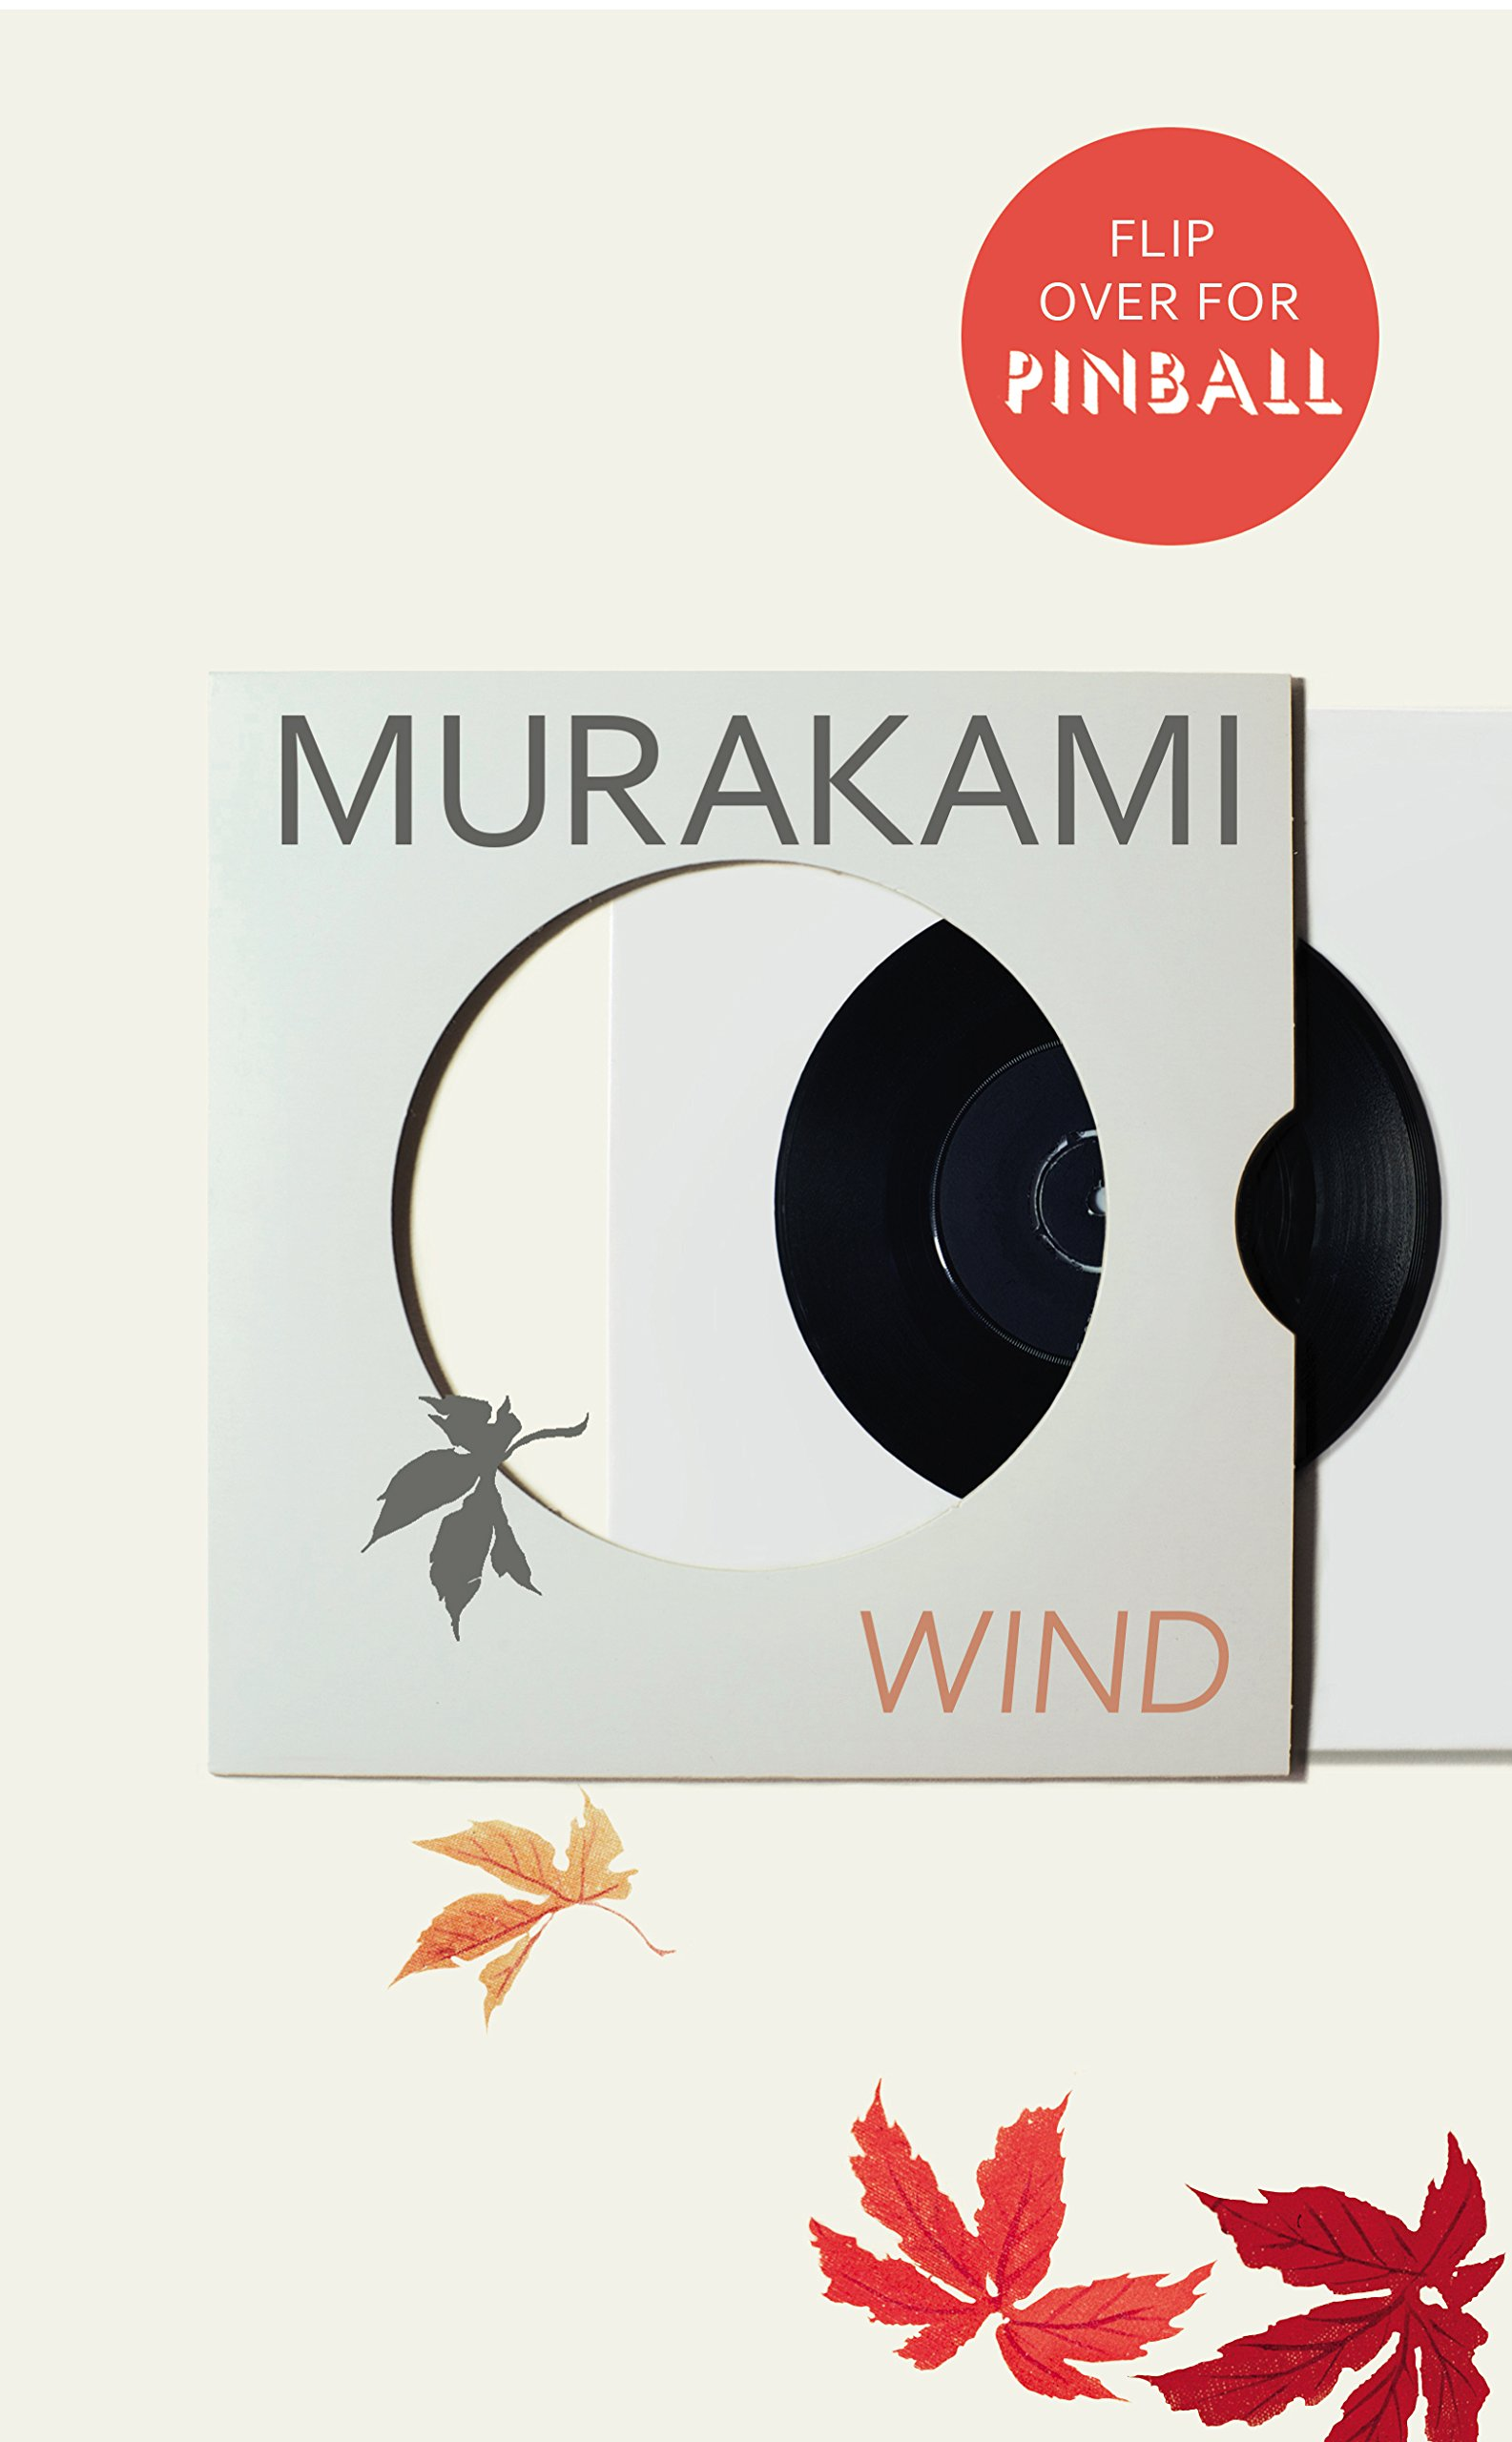 Wind; Pinball